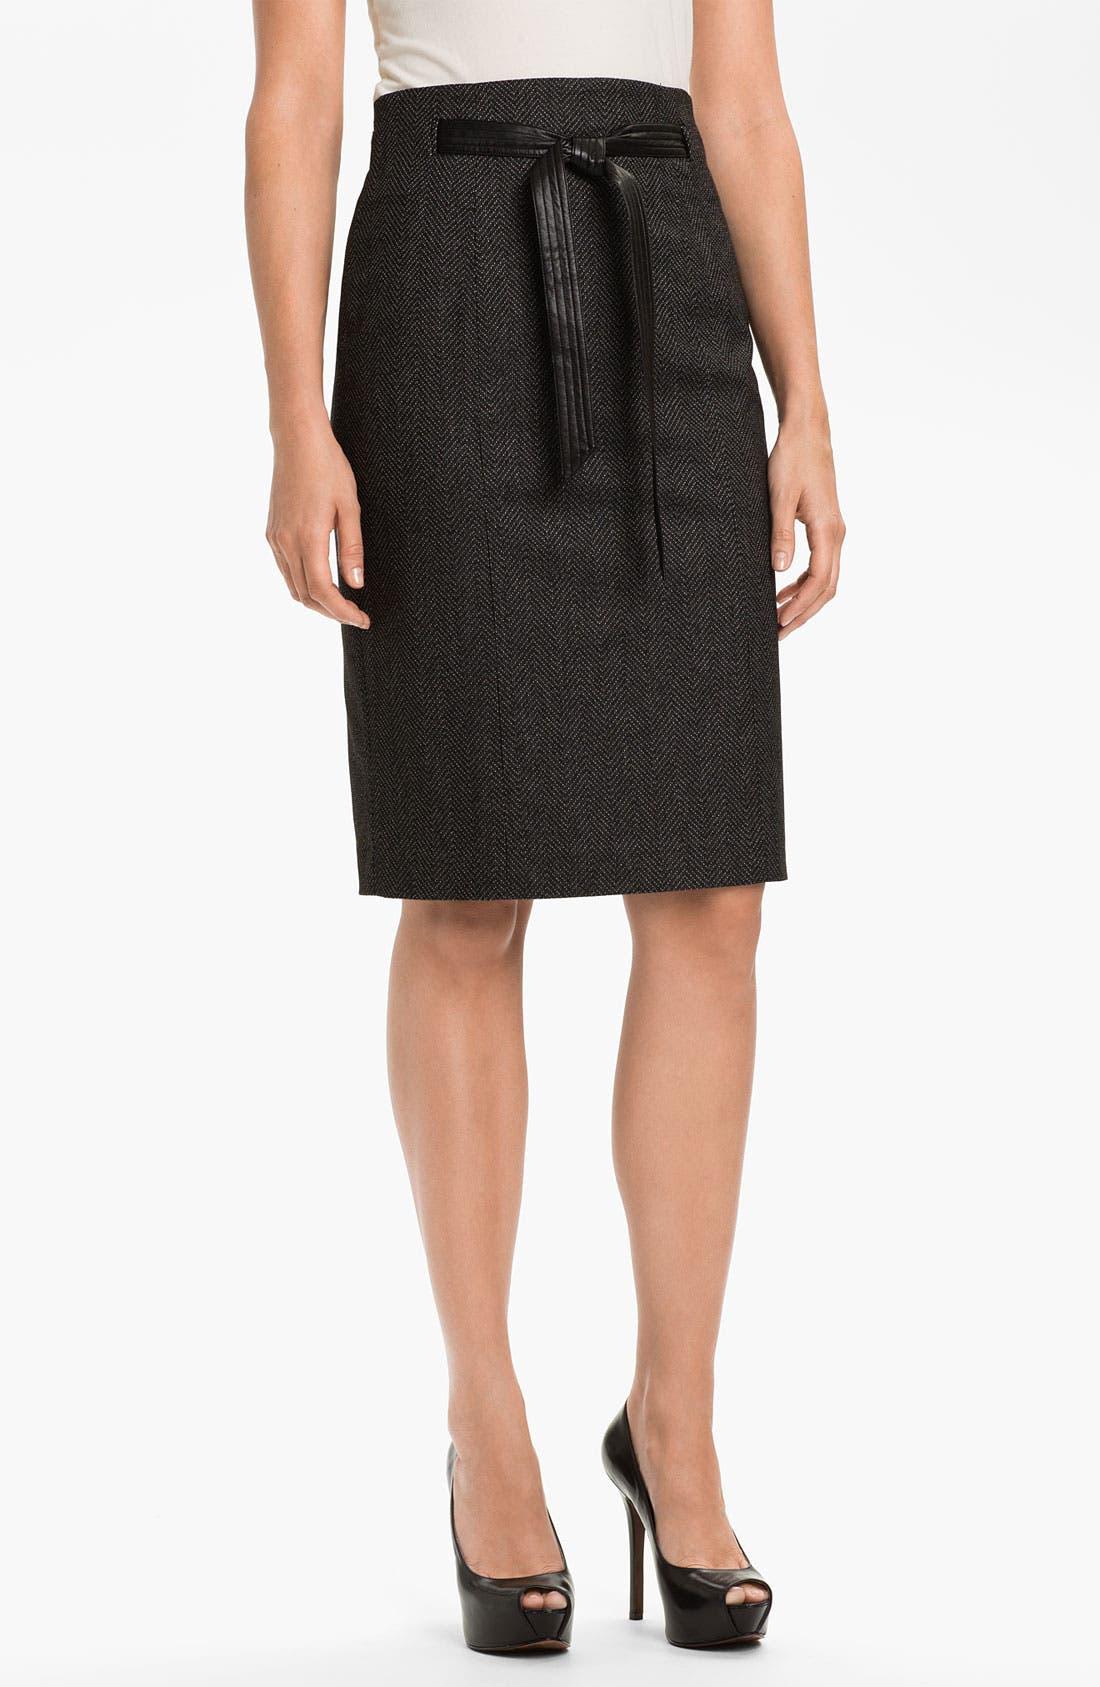 Alternate Image 1 Selected - Halogen® Faux Leather Tie Pencil Skirt (Petite)